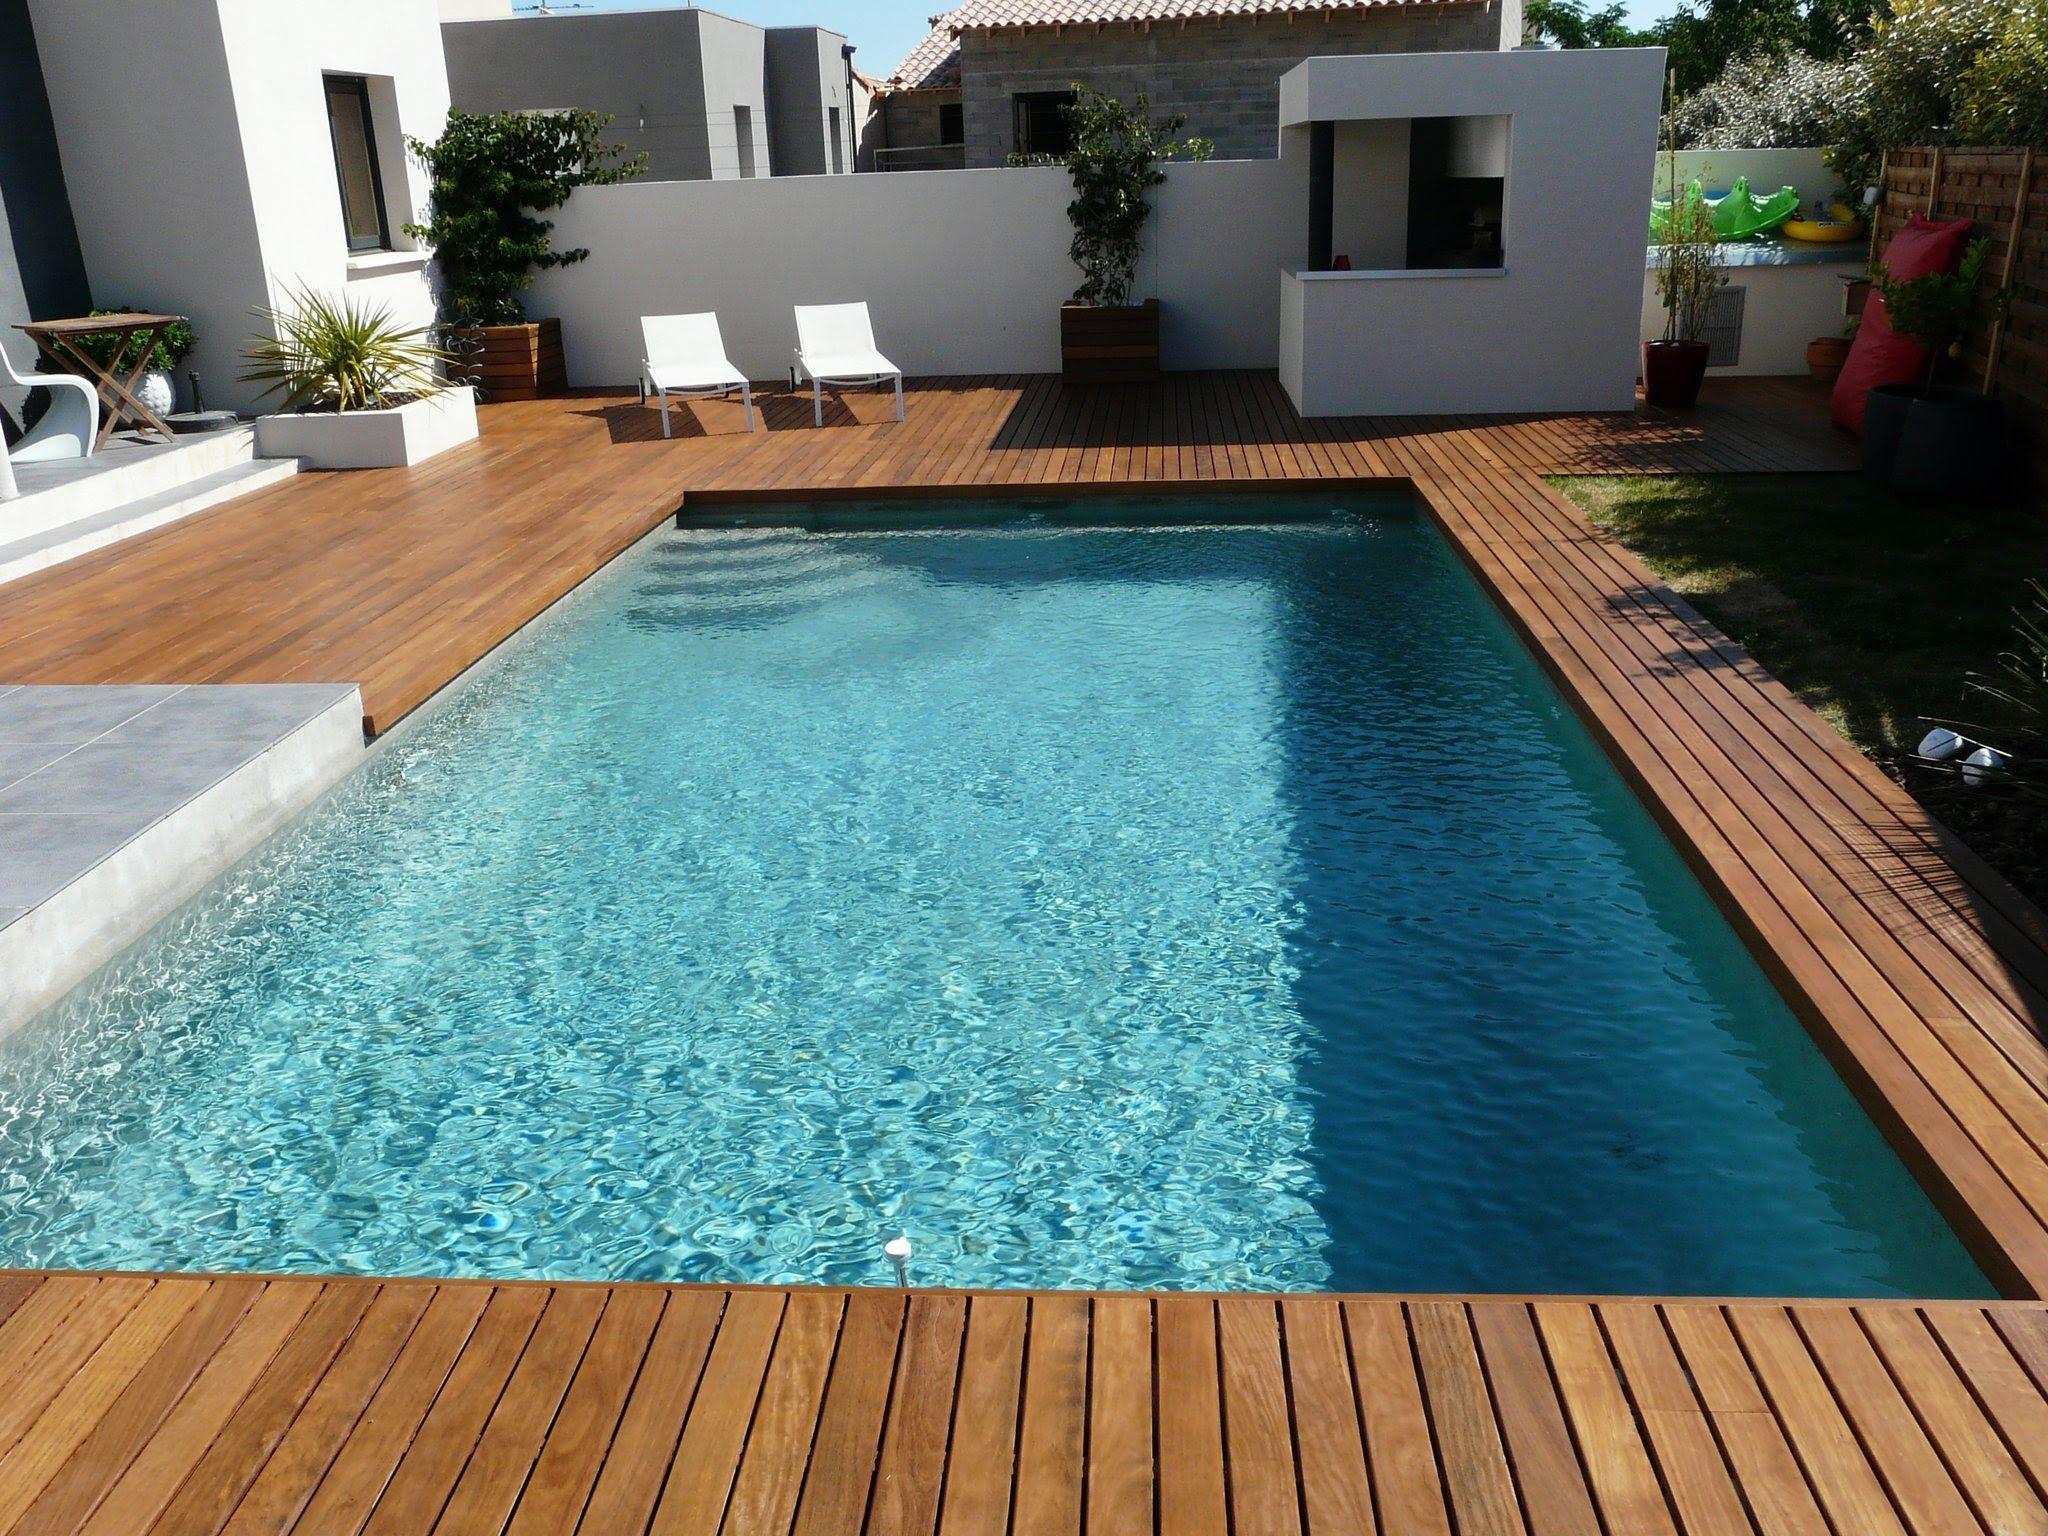 terrasse de piscine ip visserie cach e margelle int gr e. Black Bedroom Furniture Sets. Home Design Ideas